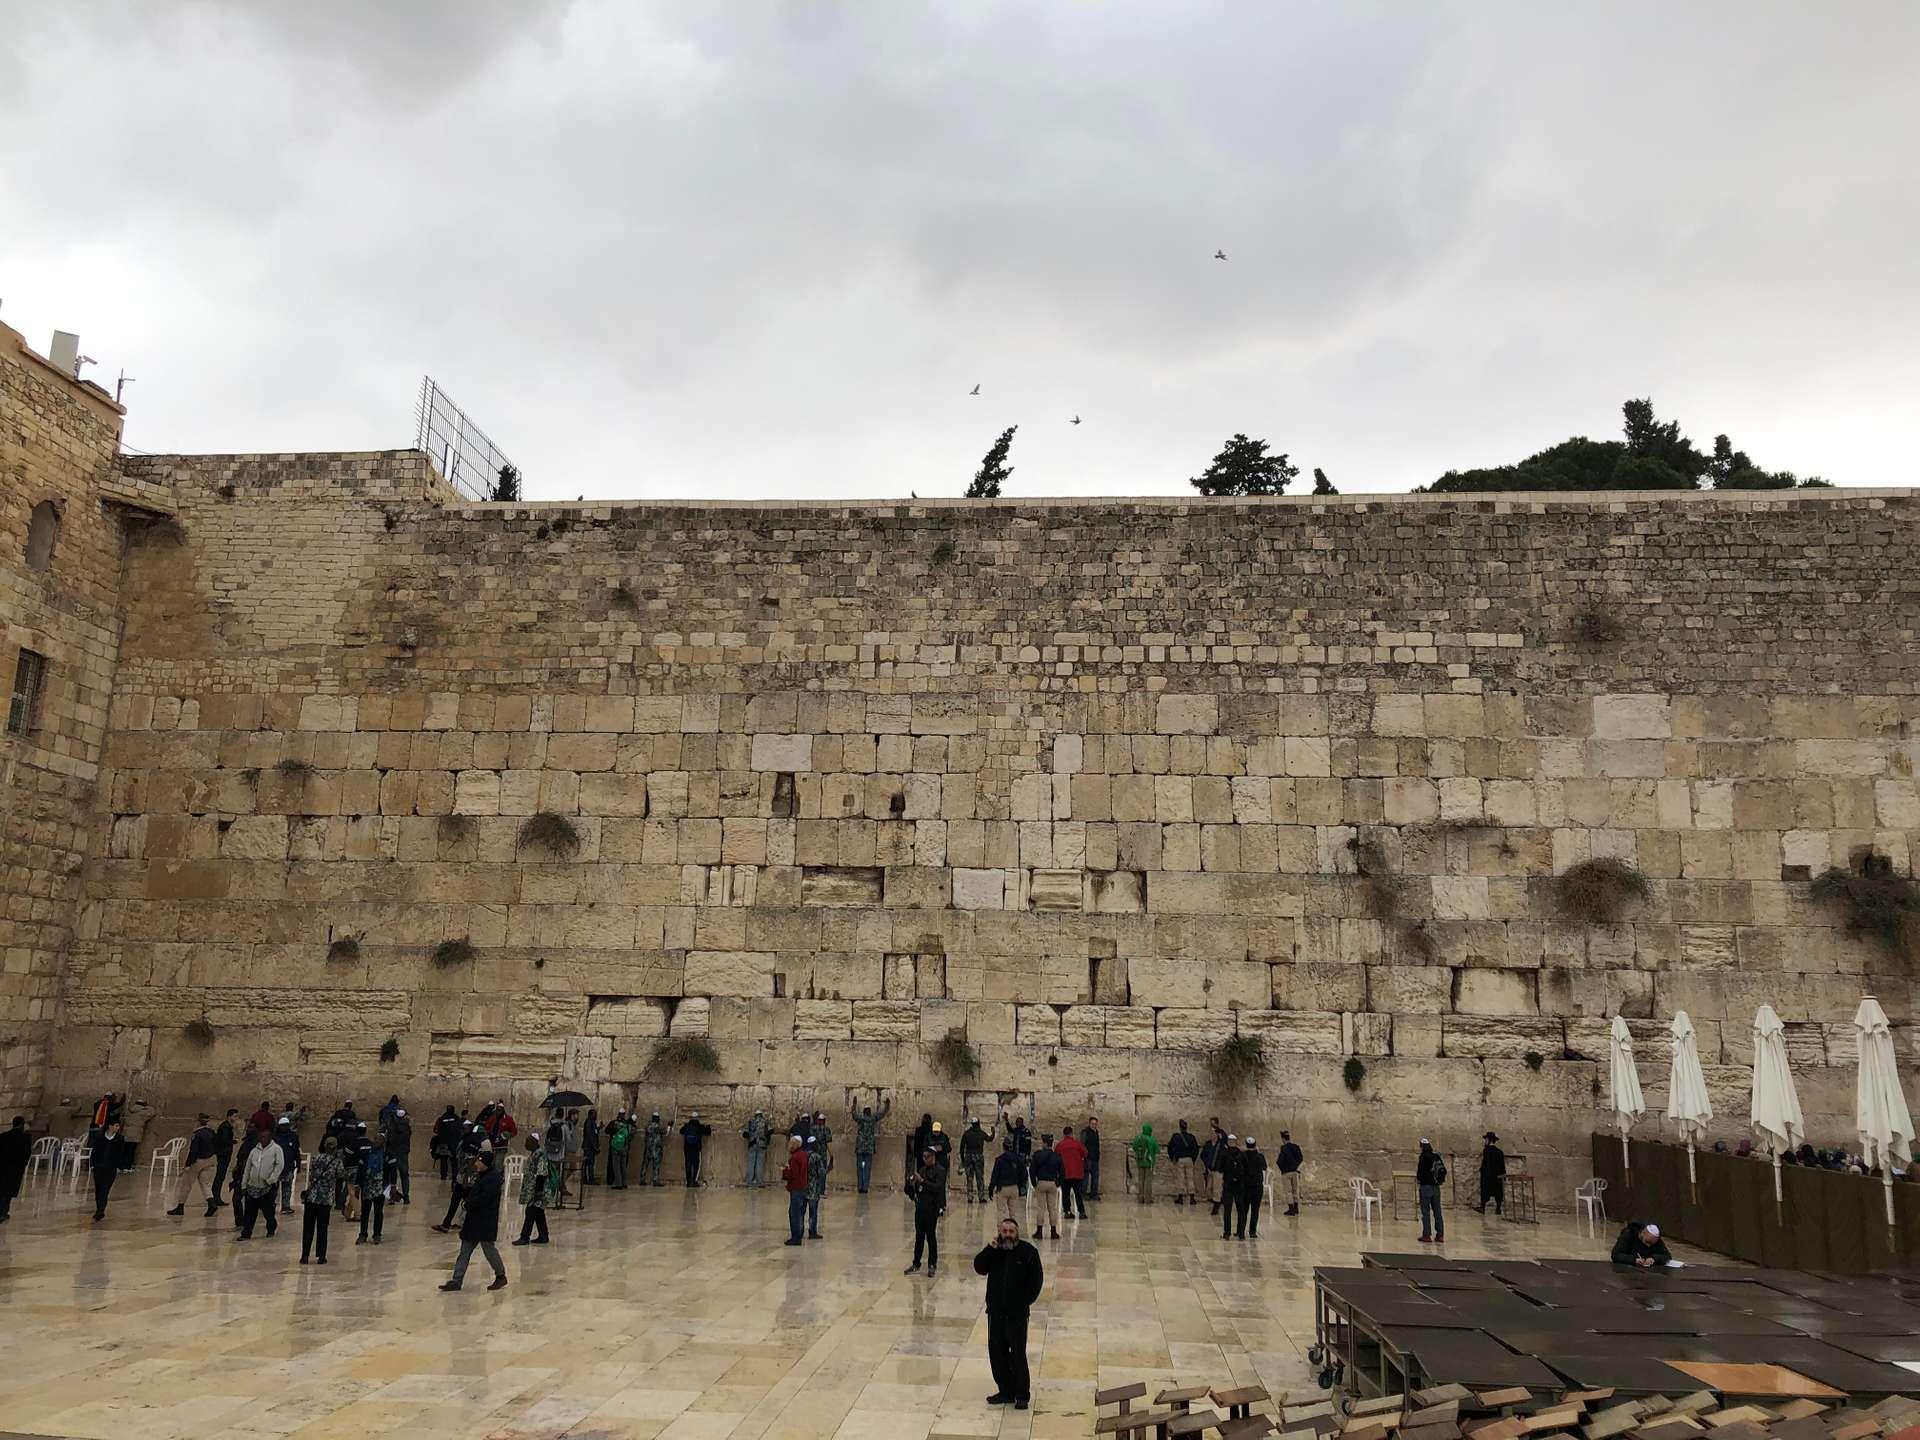 Israël, Jeruzalem, klaagmuur